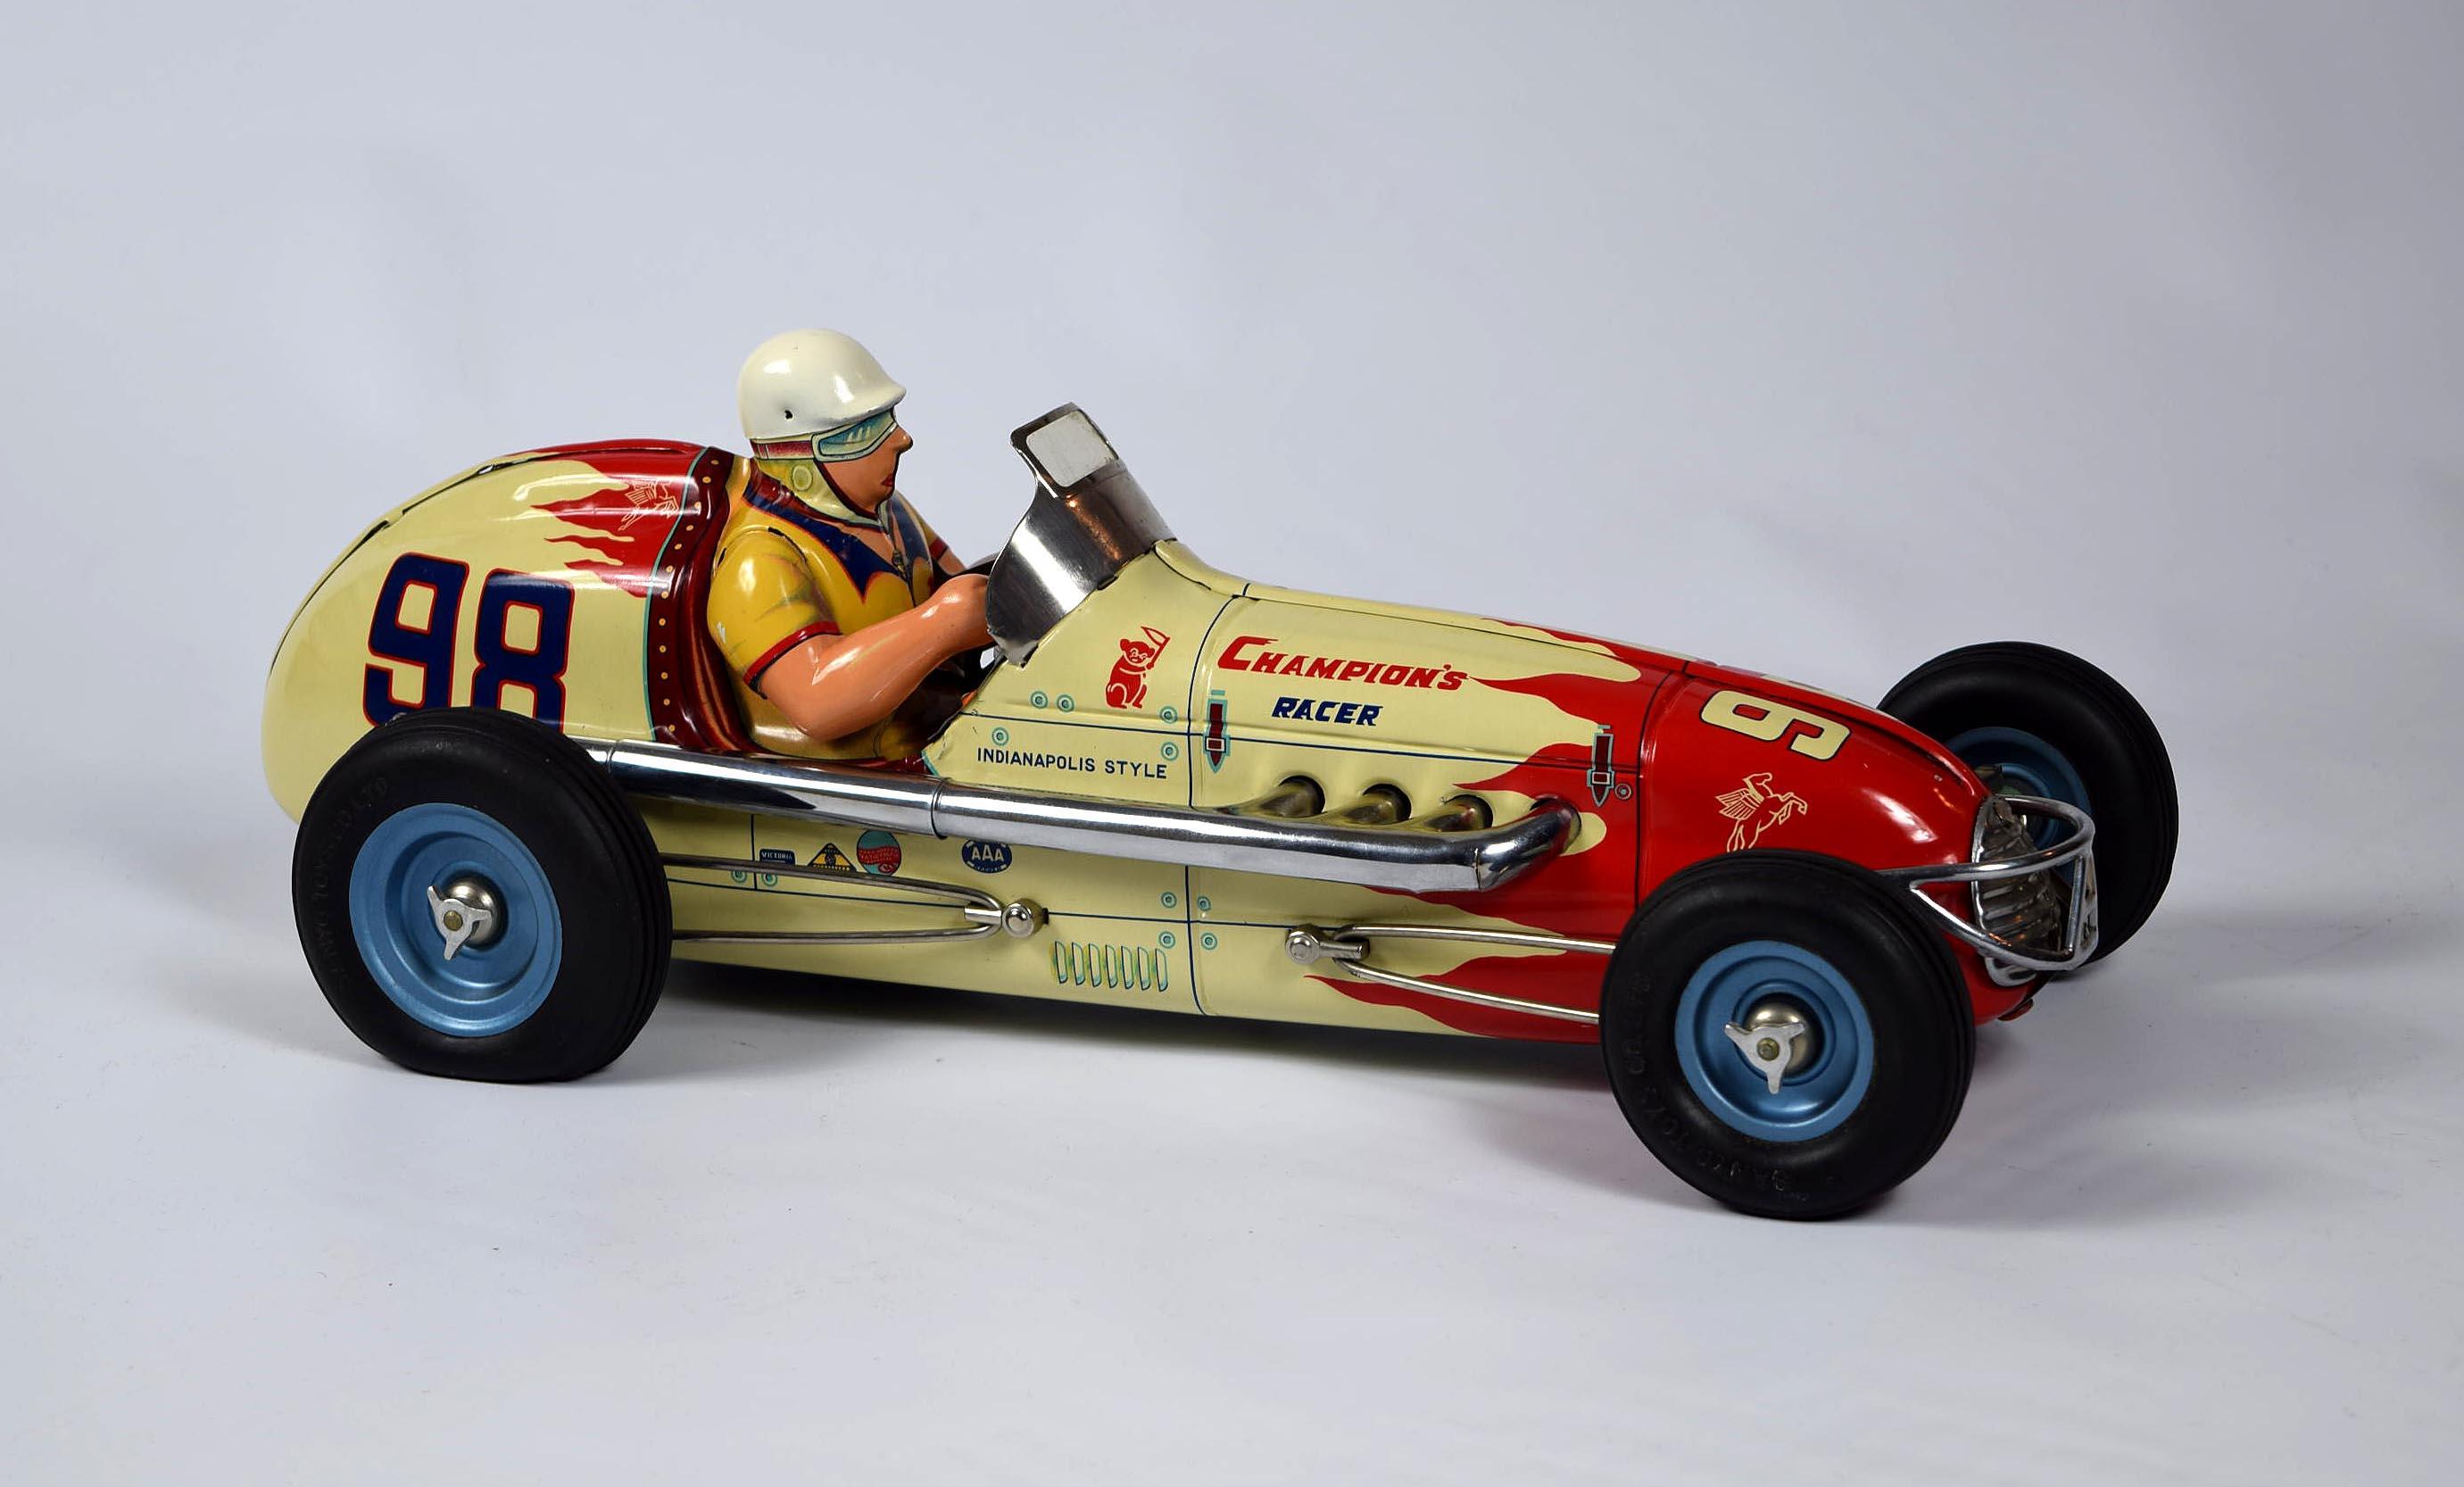 Yonezawa Champions Racer For Sale ~ Buying Yonezawa Tin Toys